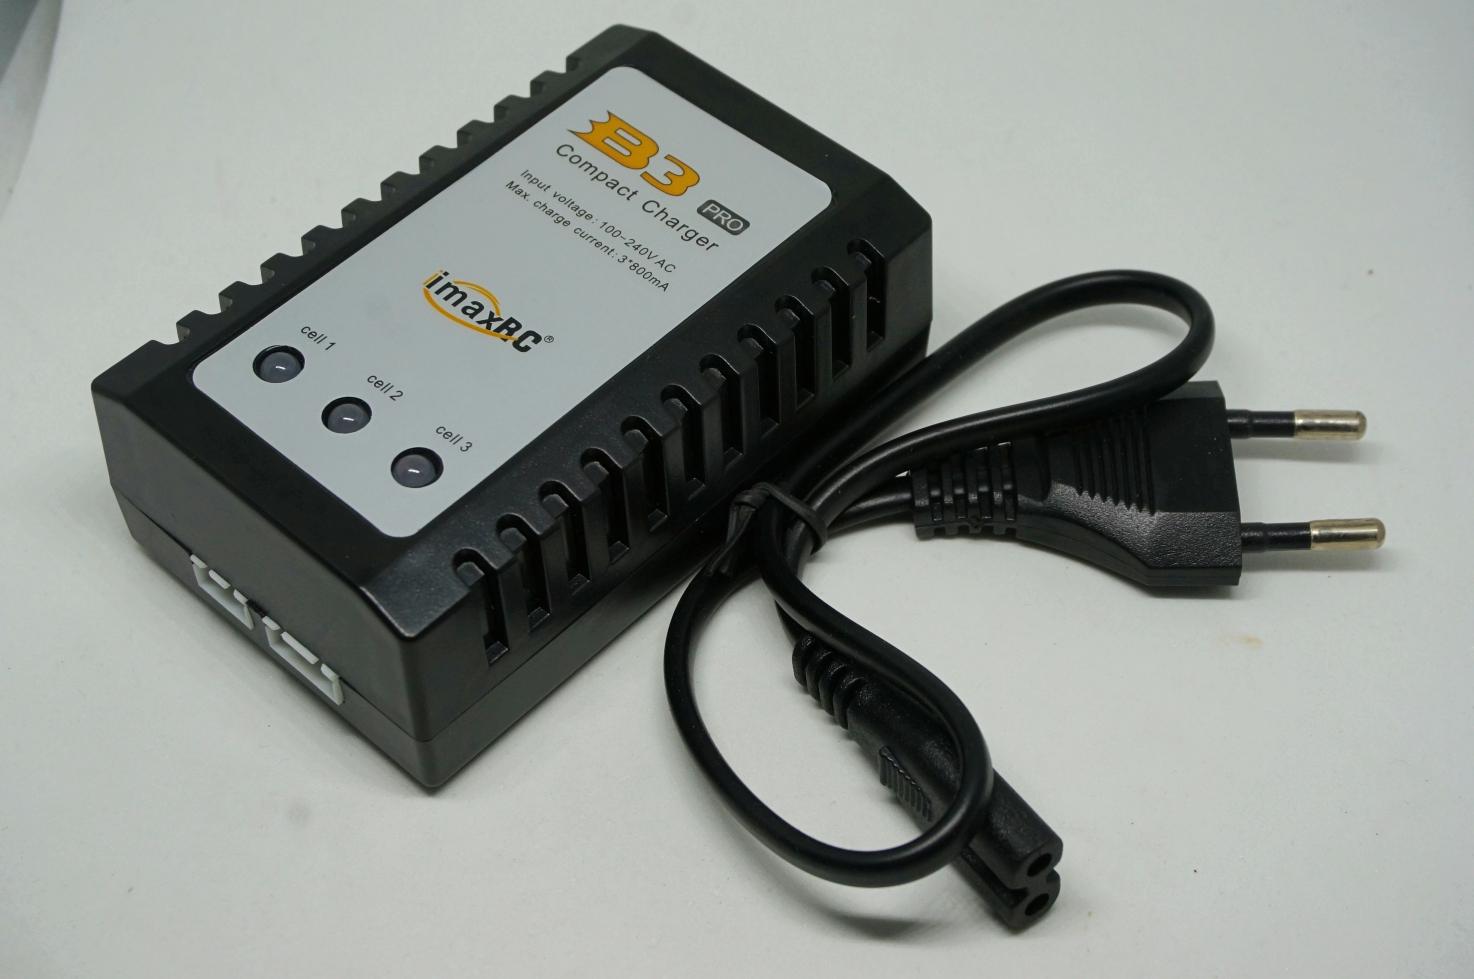 iMax B3 Lithium LiPo Charger (7.4/11.1V)